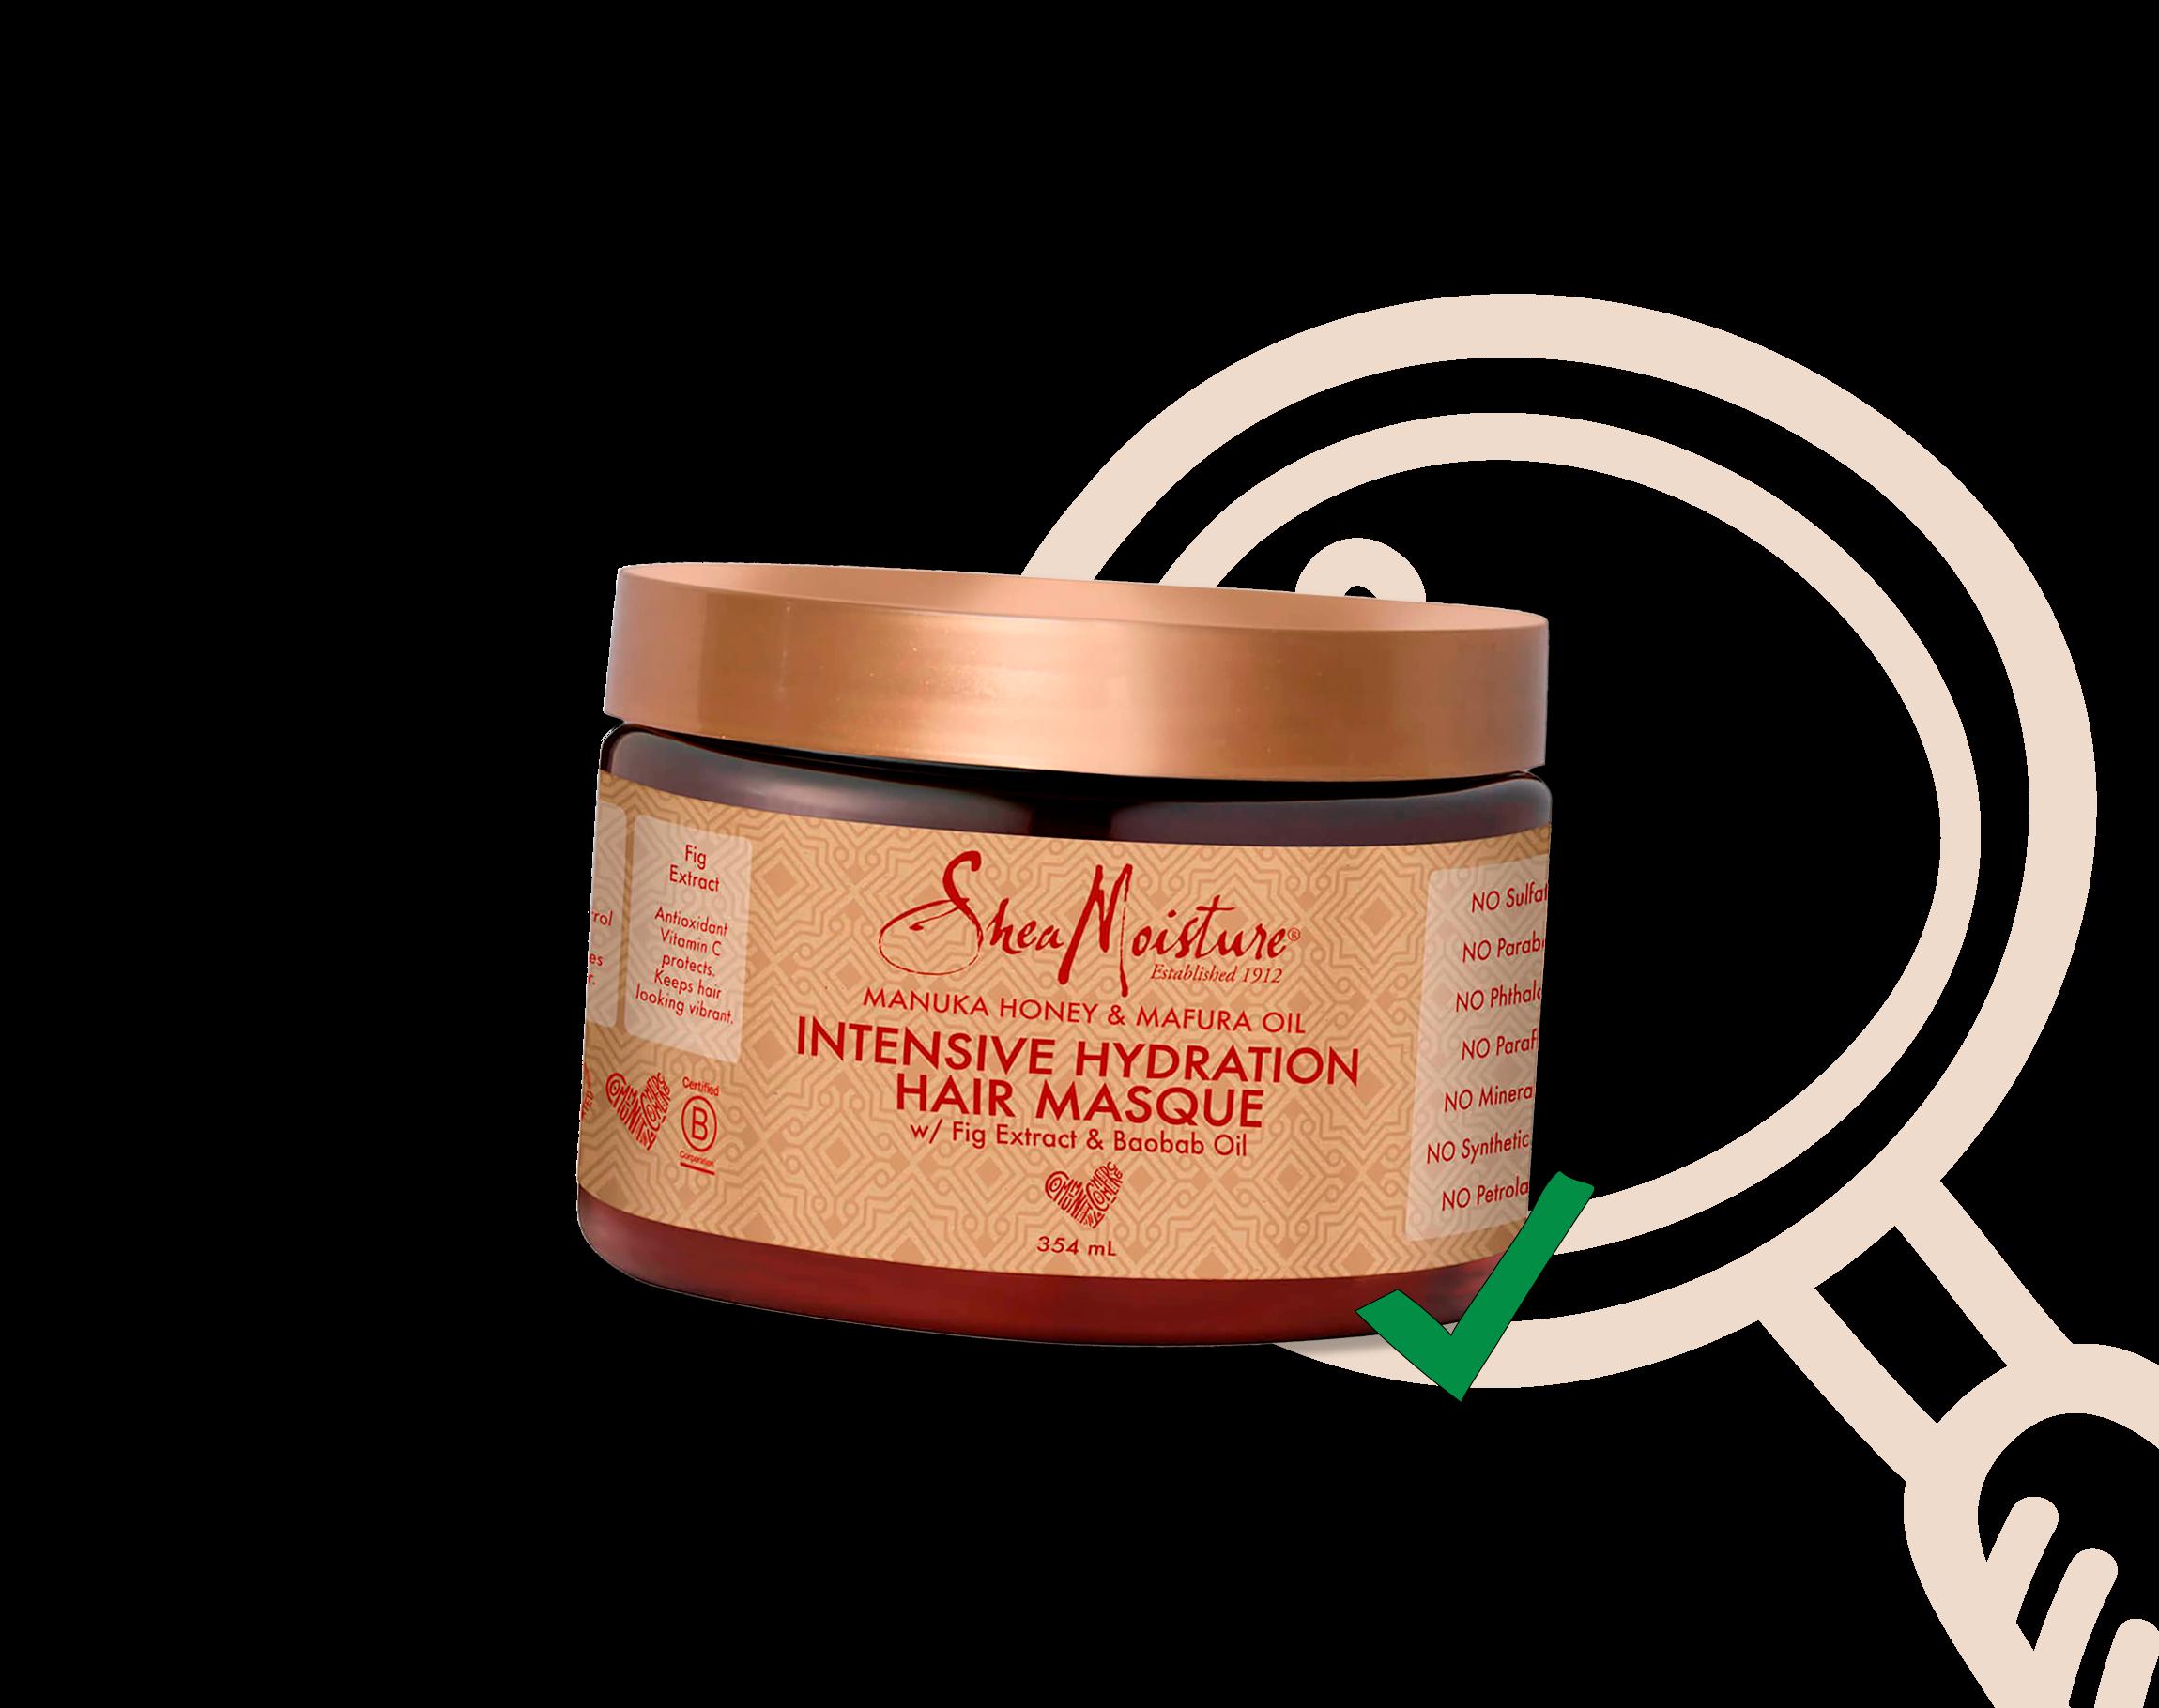 Analizamos mascarilla Manuka honey & mafura oil de shea moisture